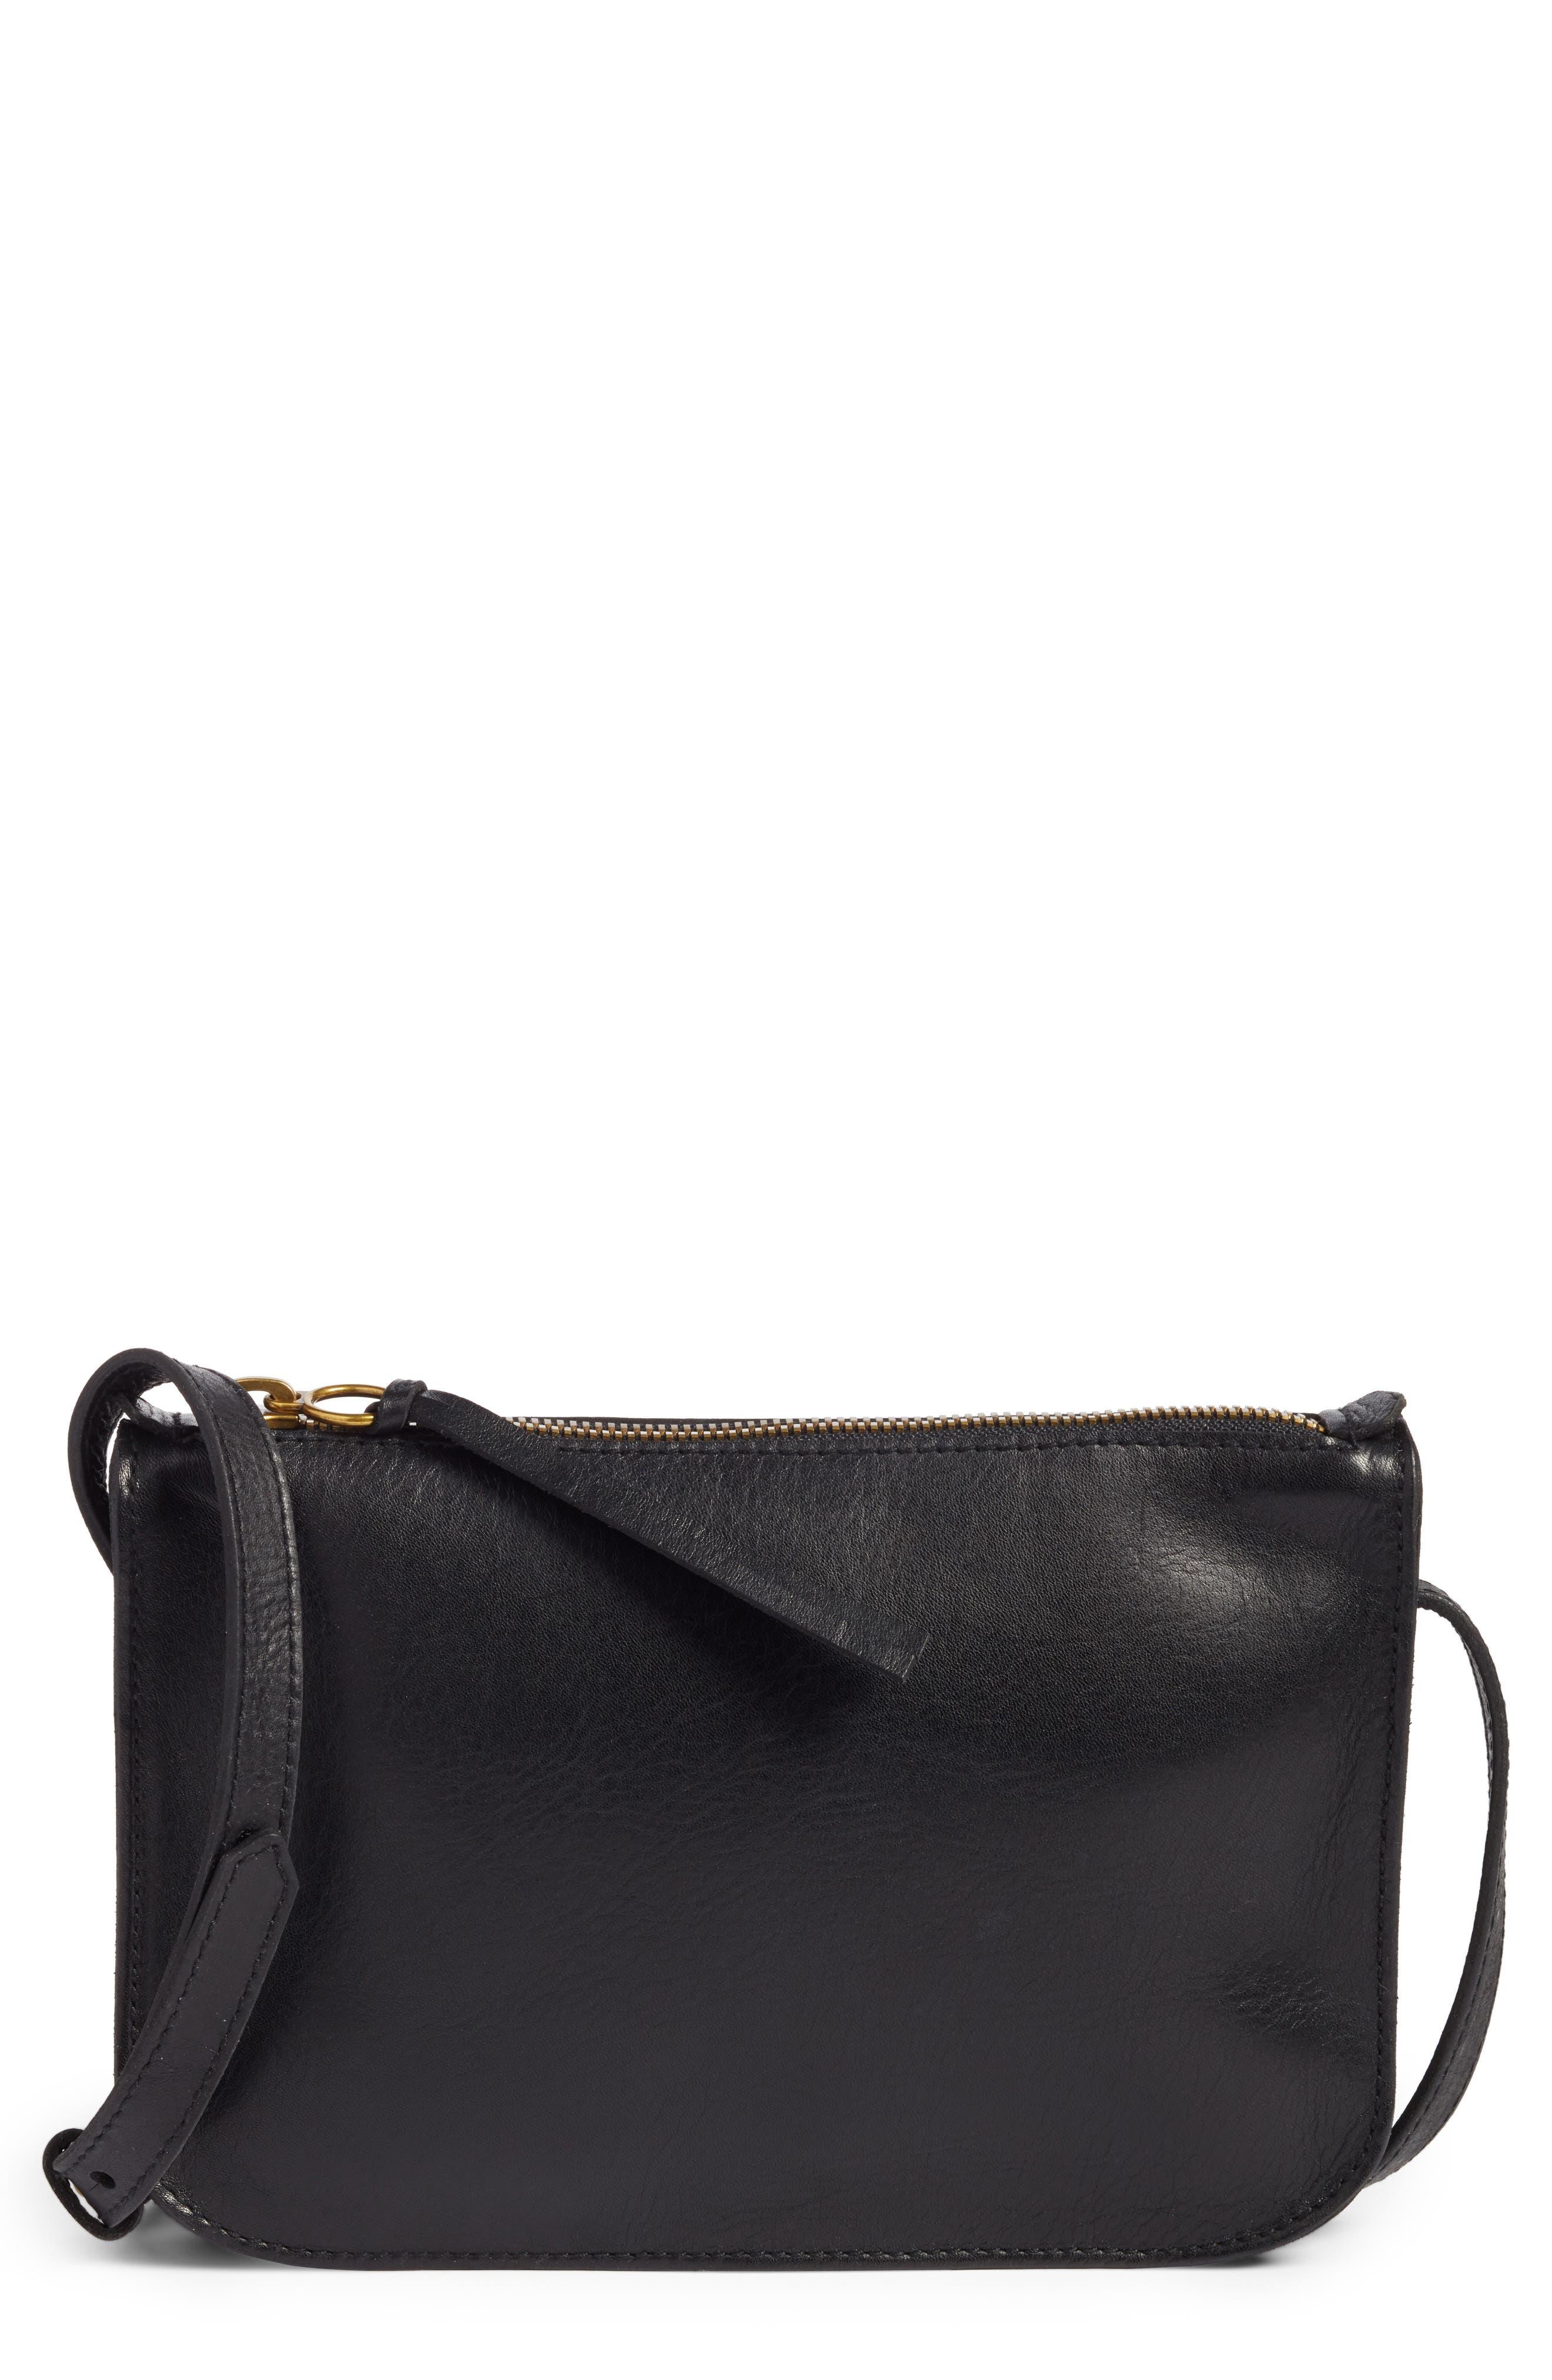 Simple Leather Crossbody Bag